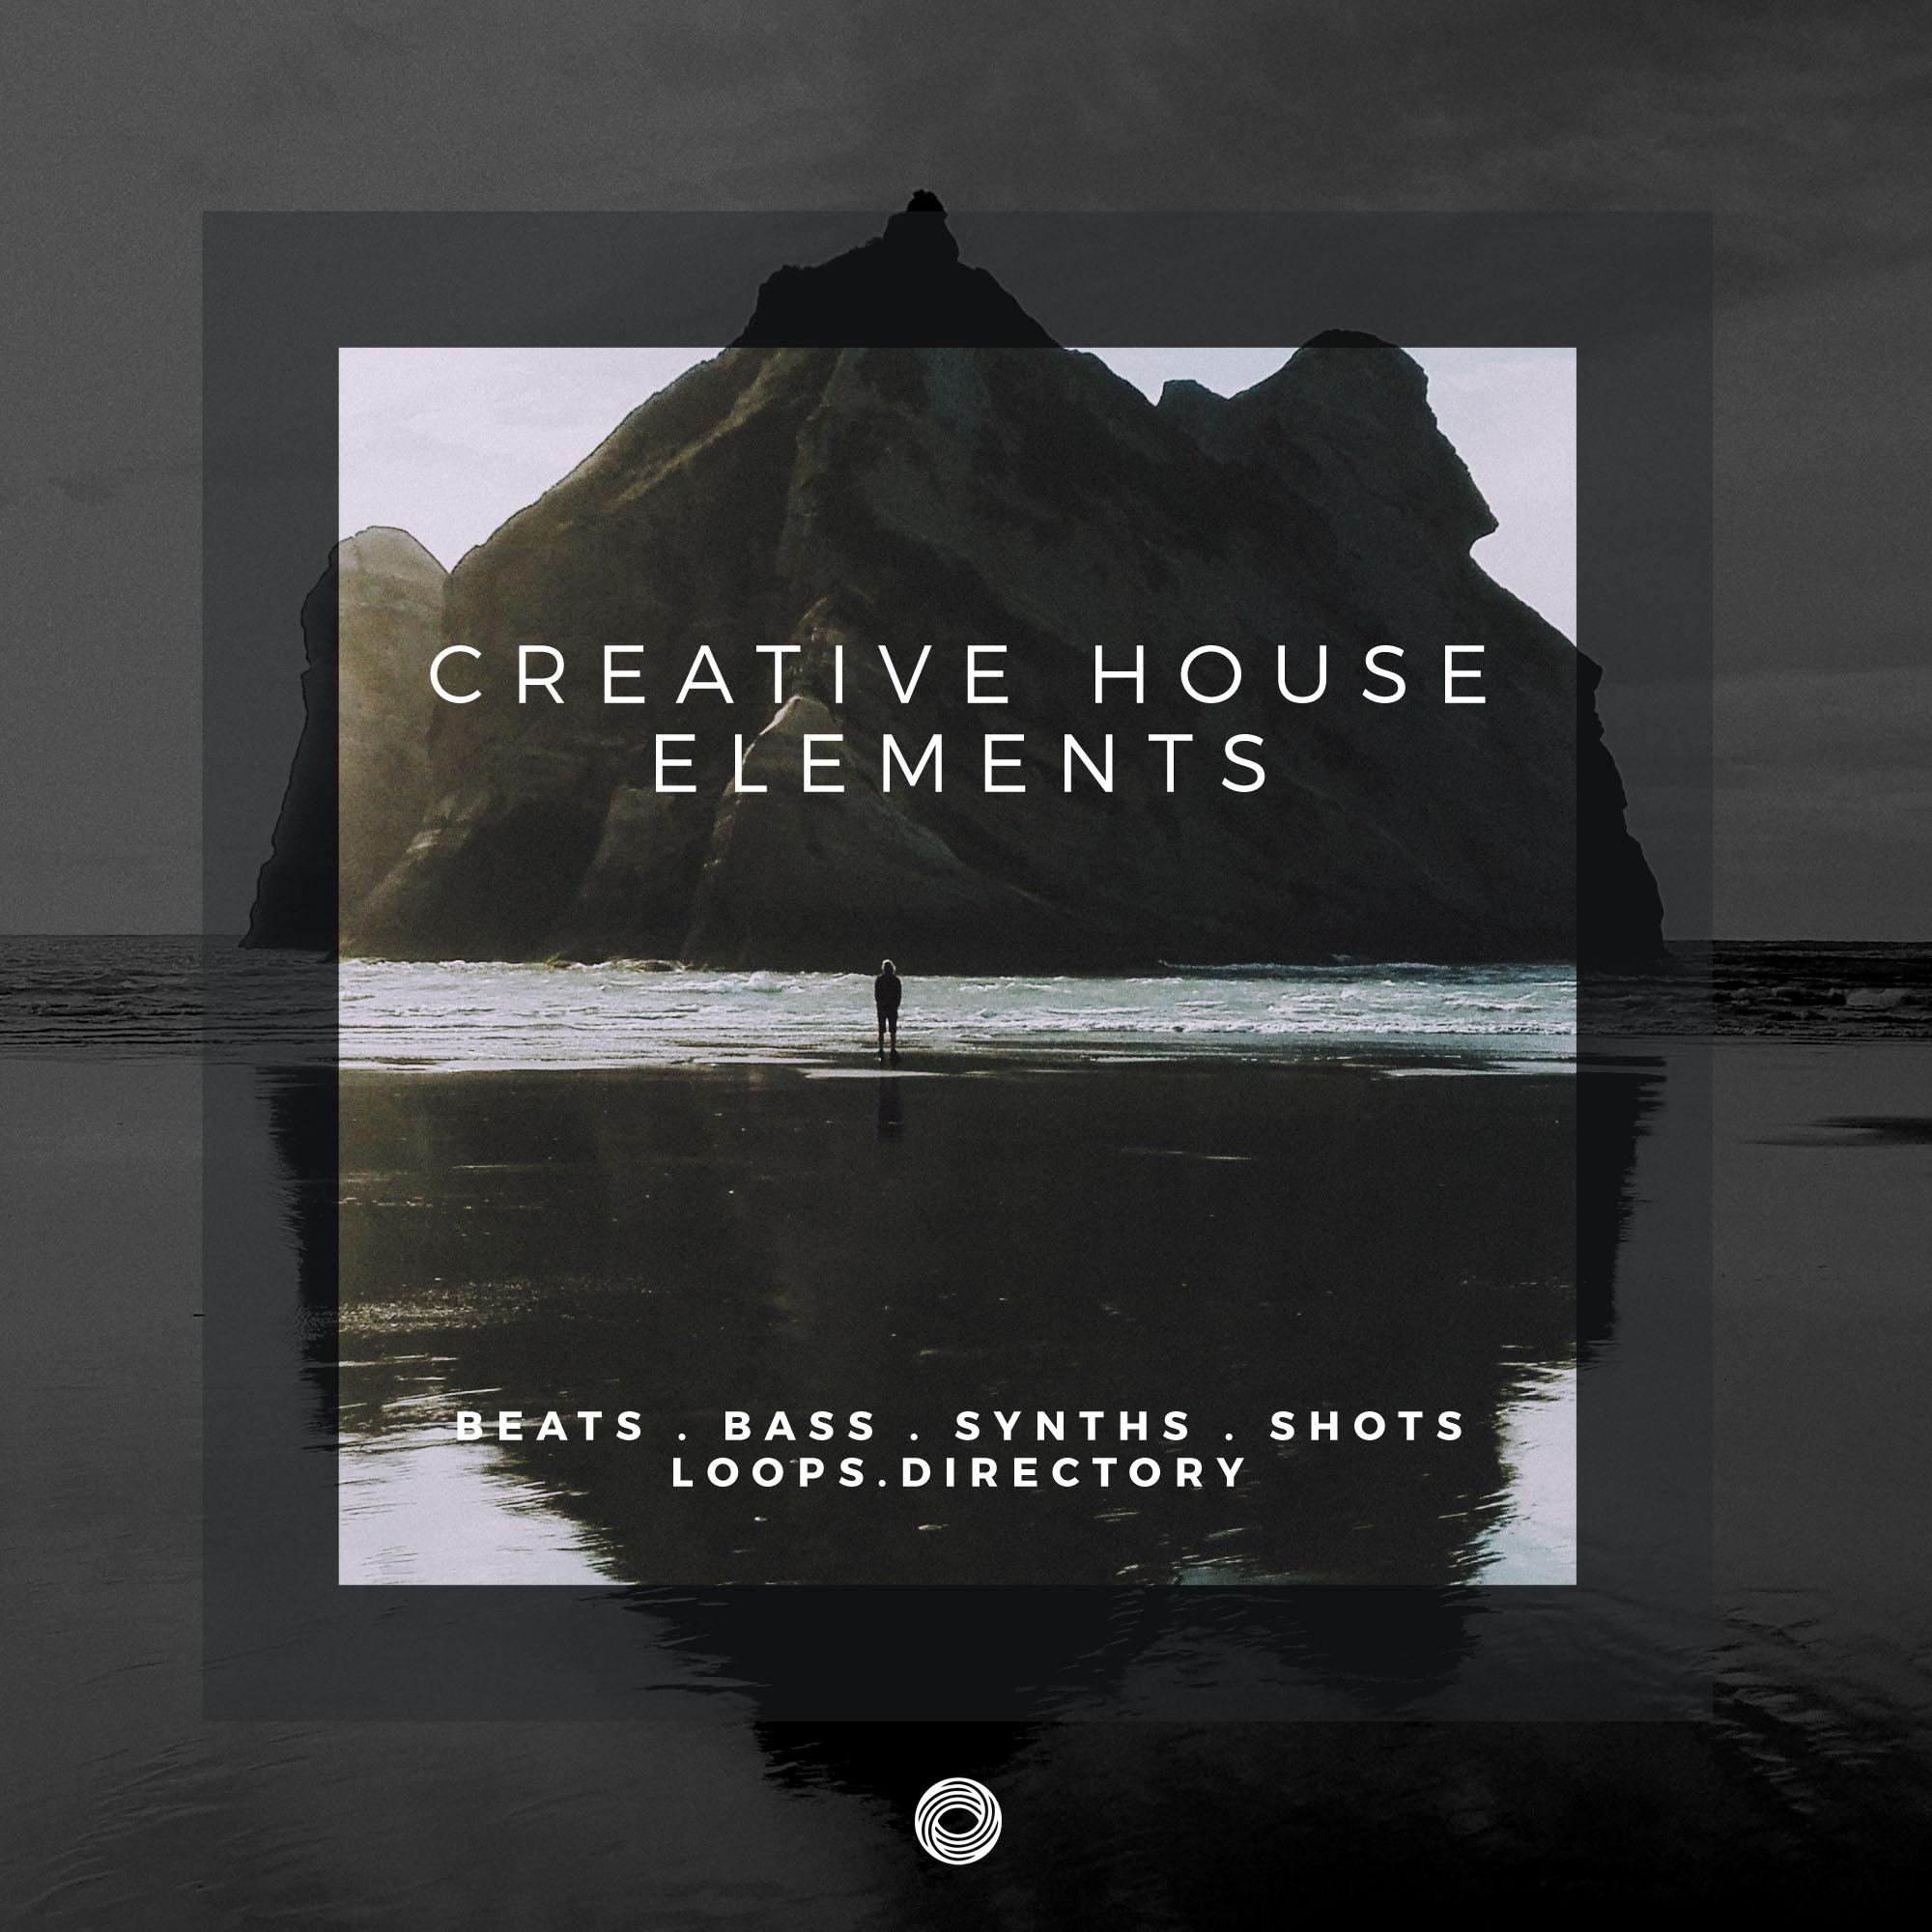 Creative House Elements